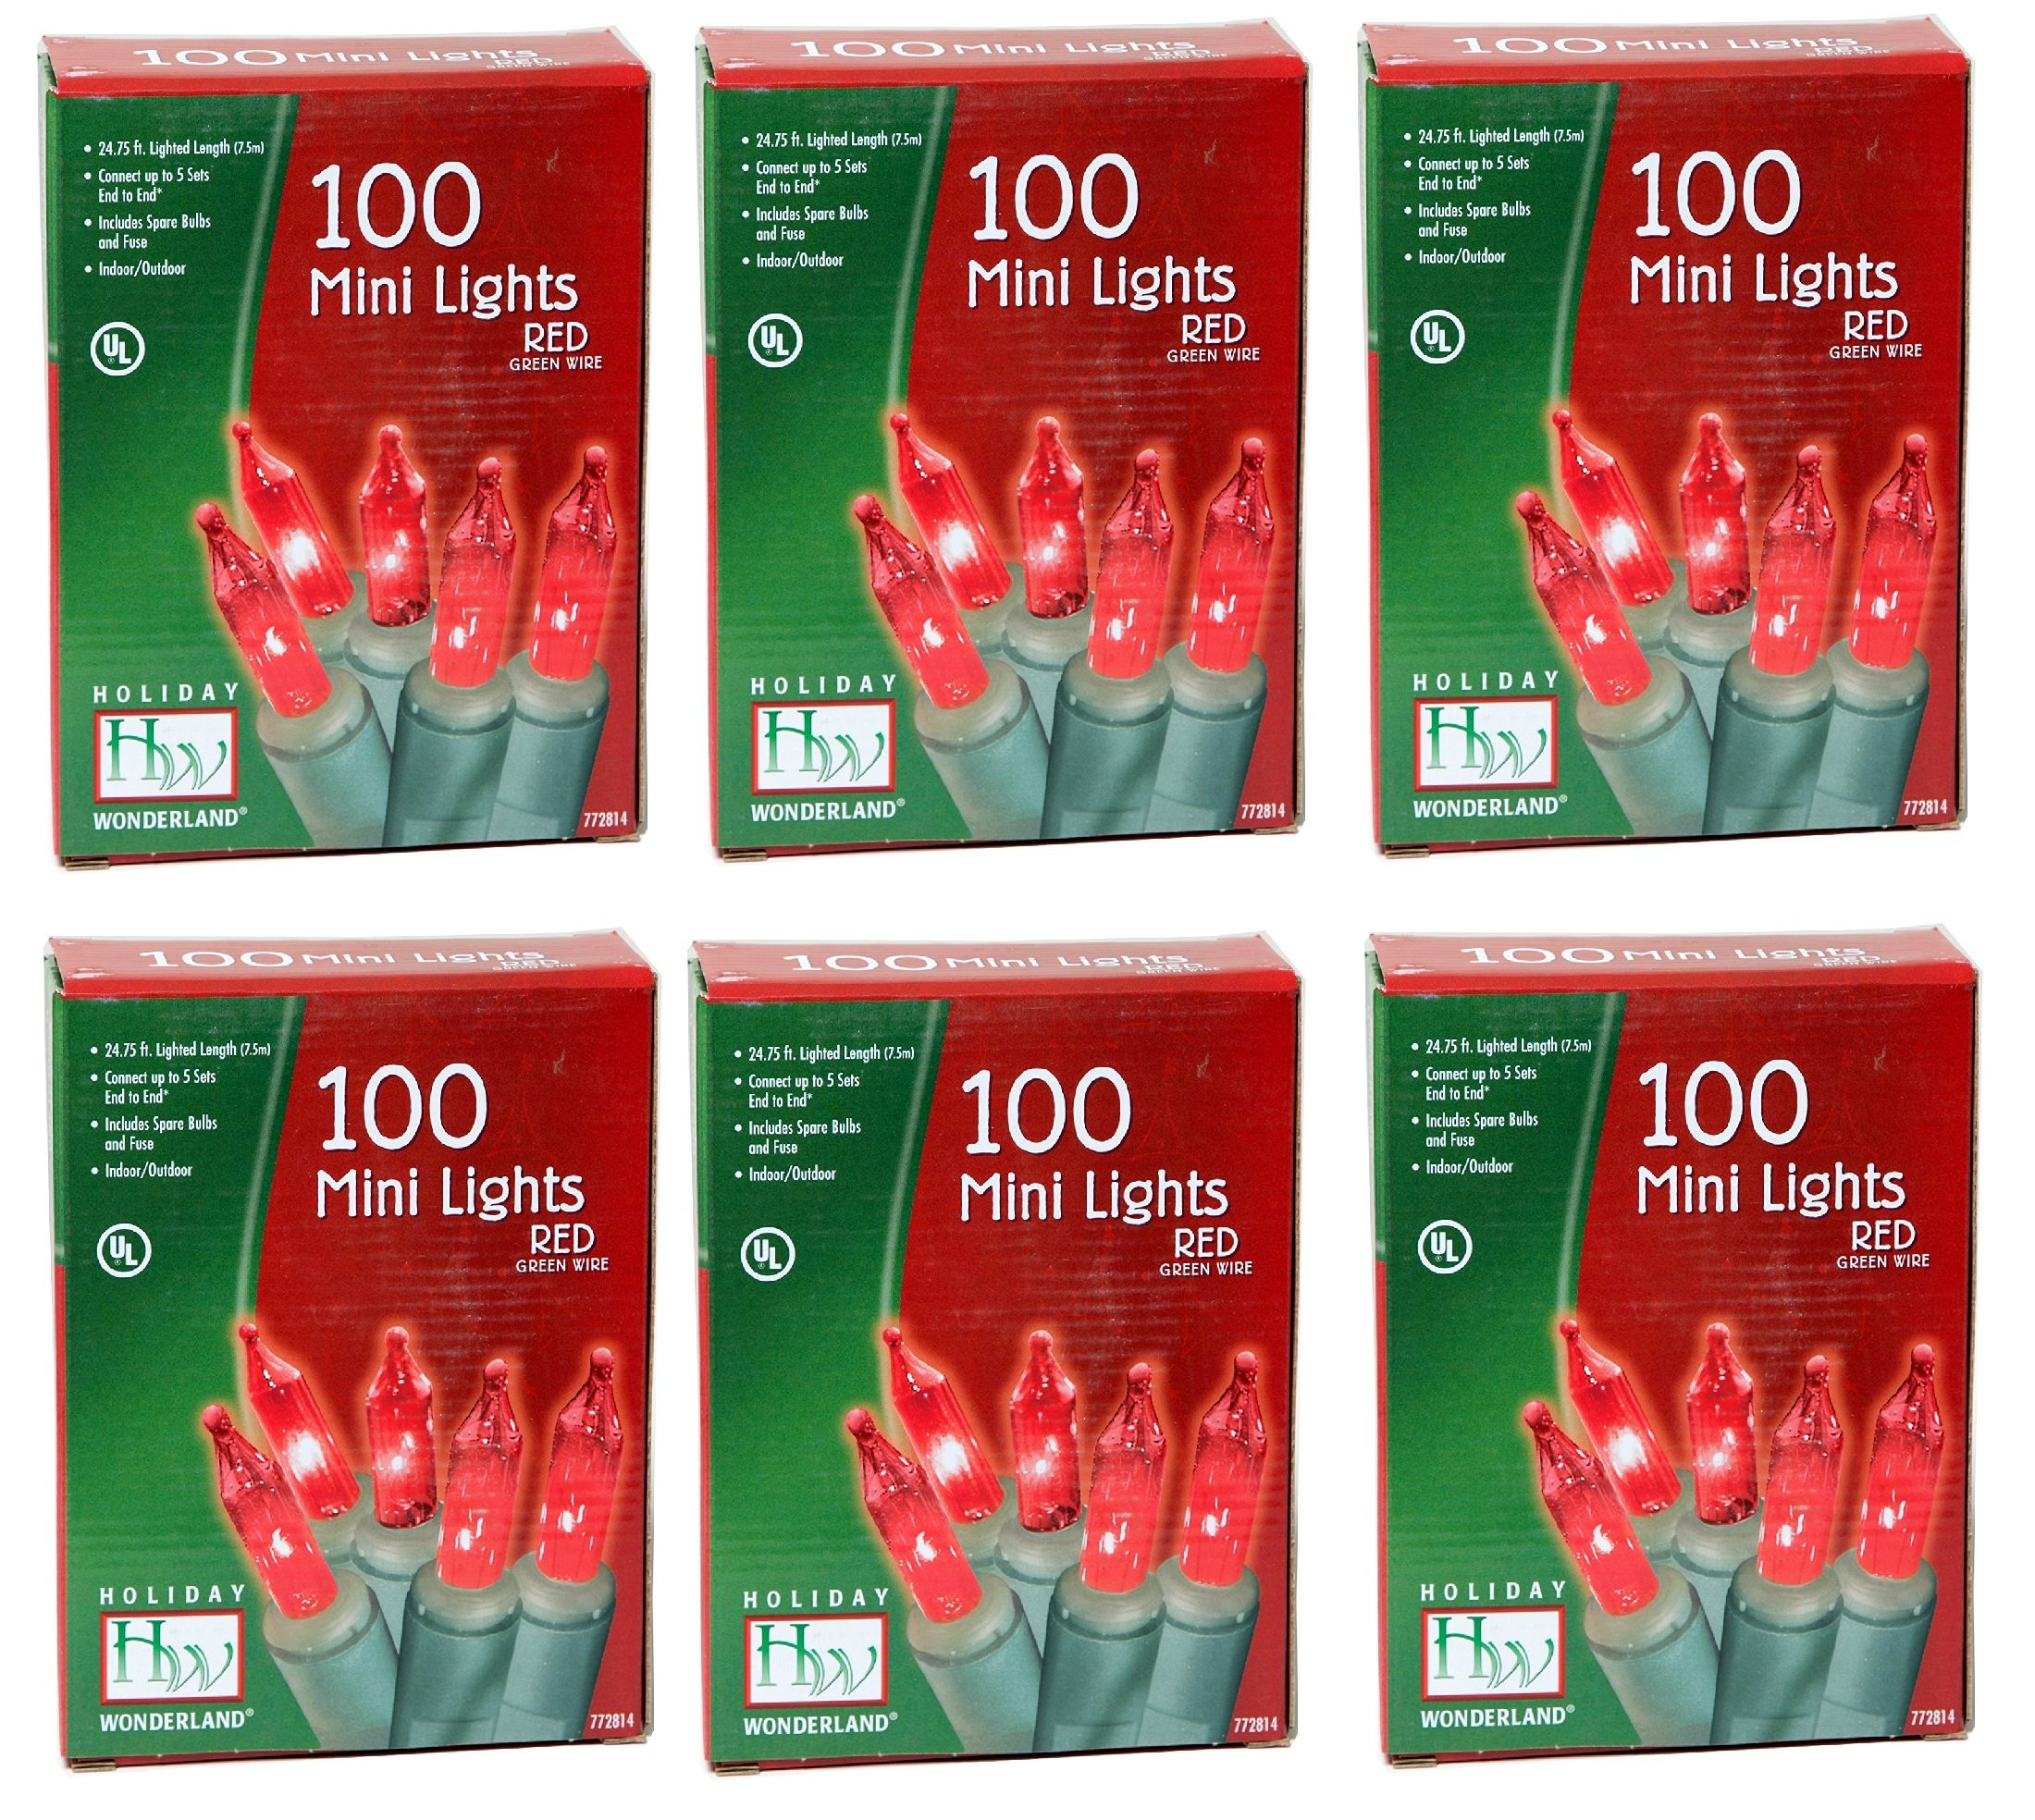 Noma/Inliten Holiday Wonderland's 100-Count Red Light Set (Pack of 6)